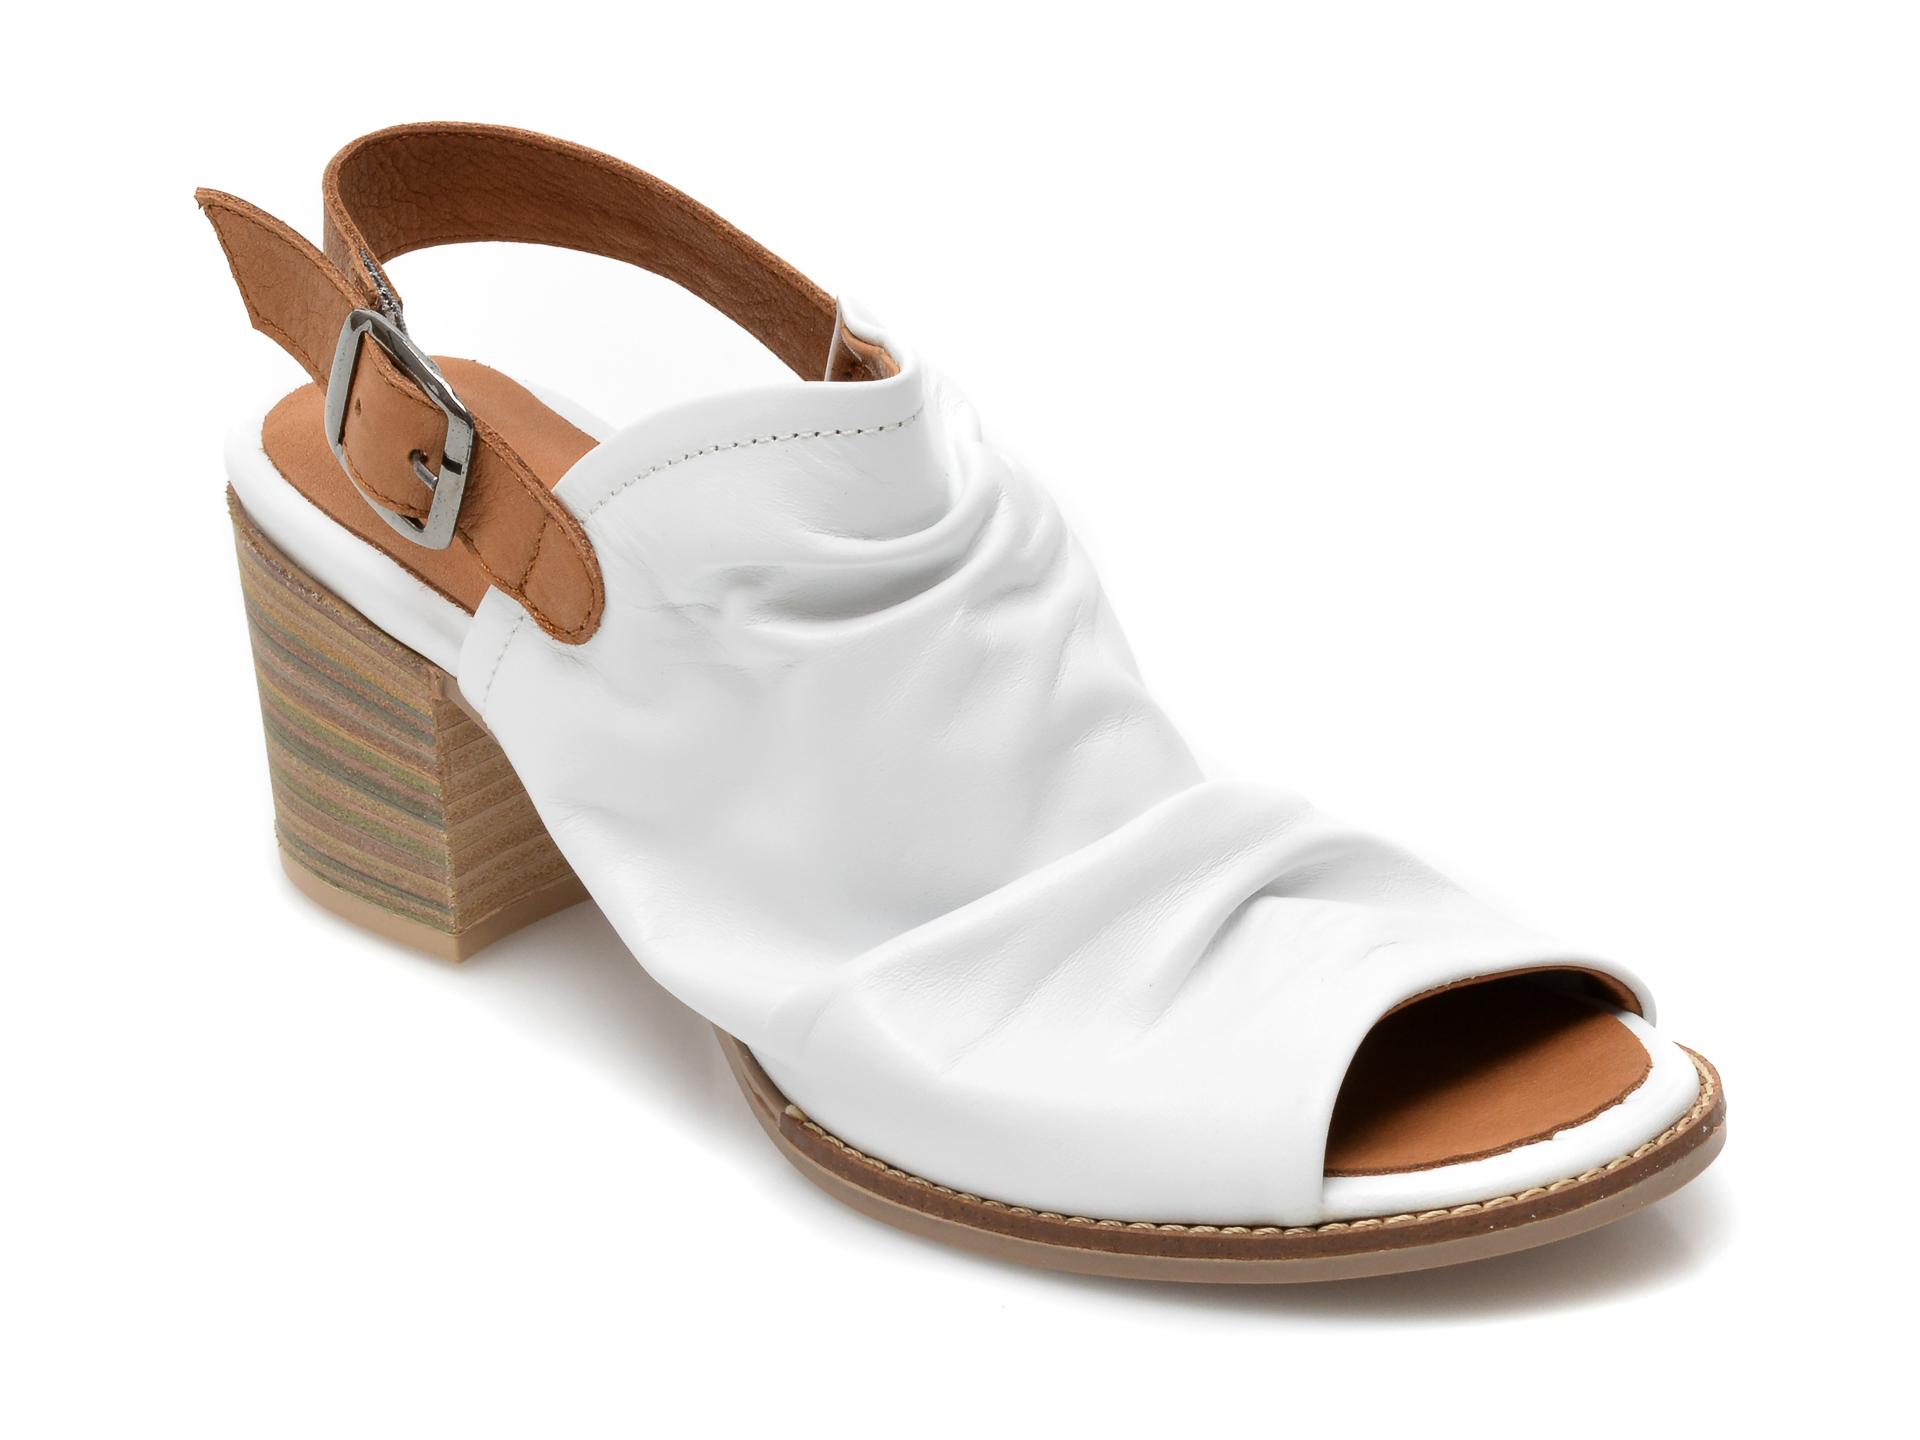 Sandale BABOOS albe, 1702, din piele naturala imagine otter.ro 2021